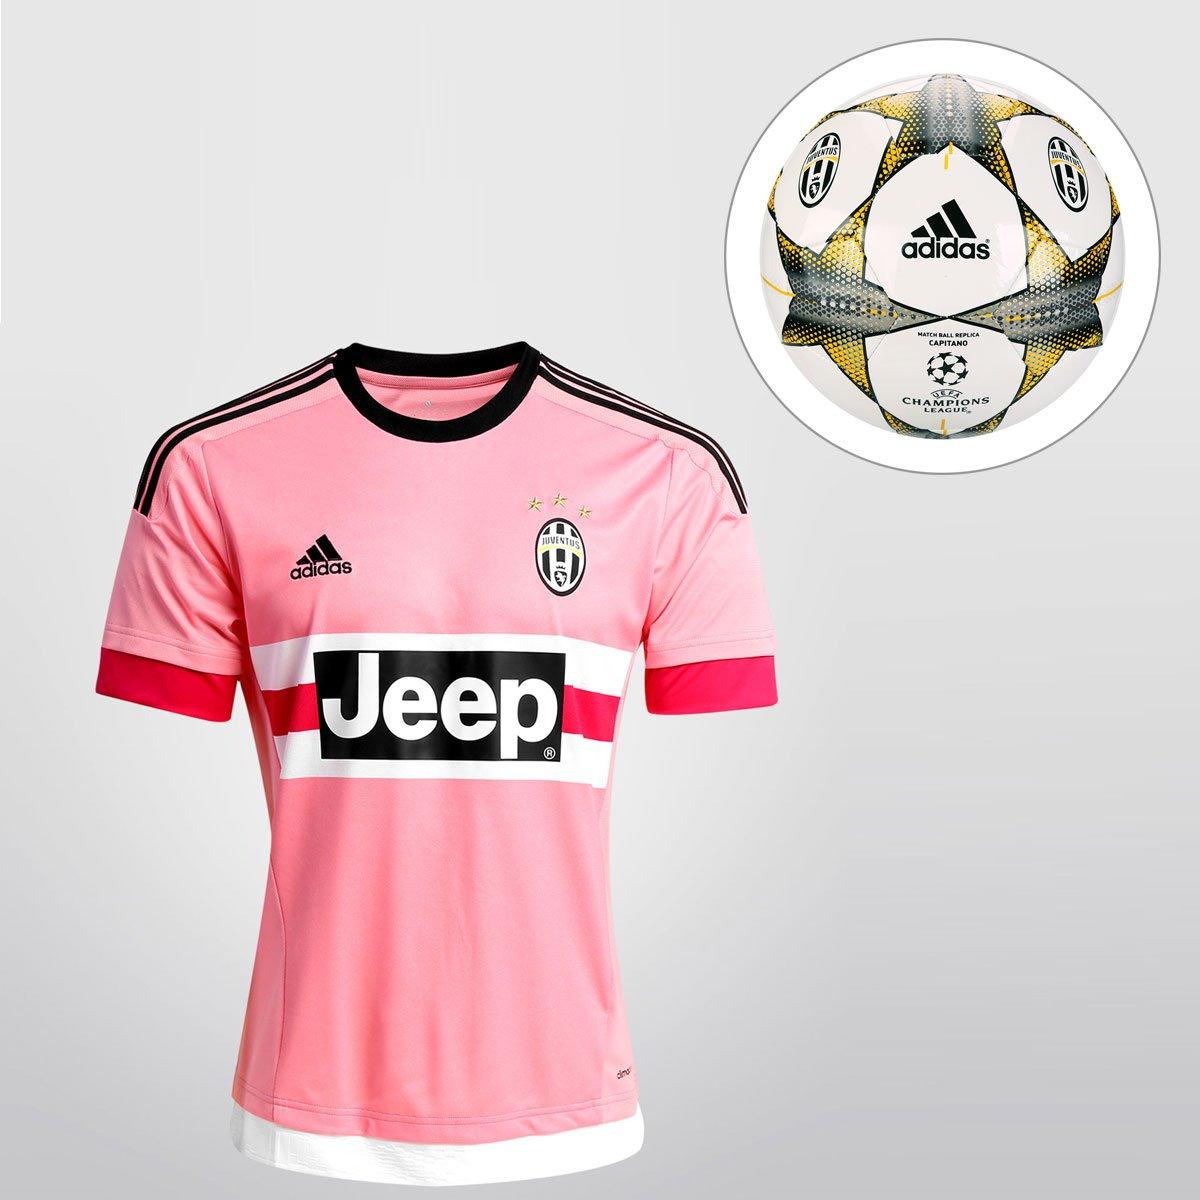 Kit Camisa Adidas Juventus Away 15 16 s nº + Bola Adidas Juventus Finale 15  Campo - Compre Agora  8dfed5da75136